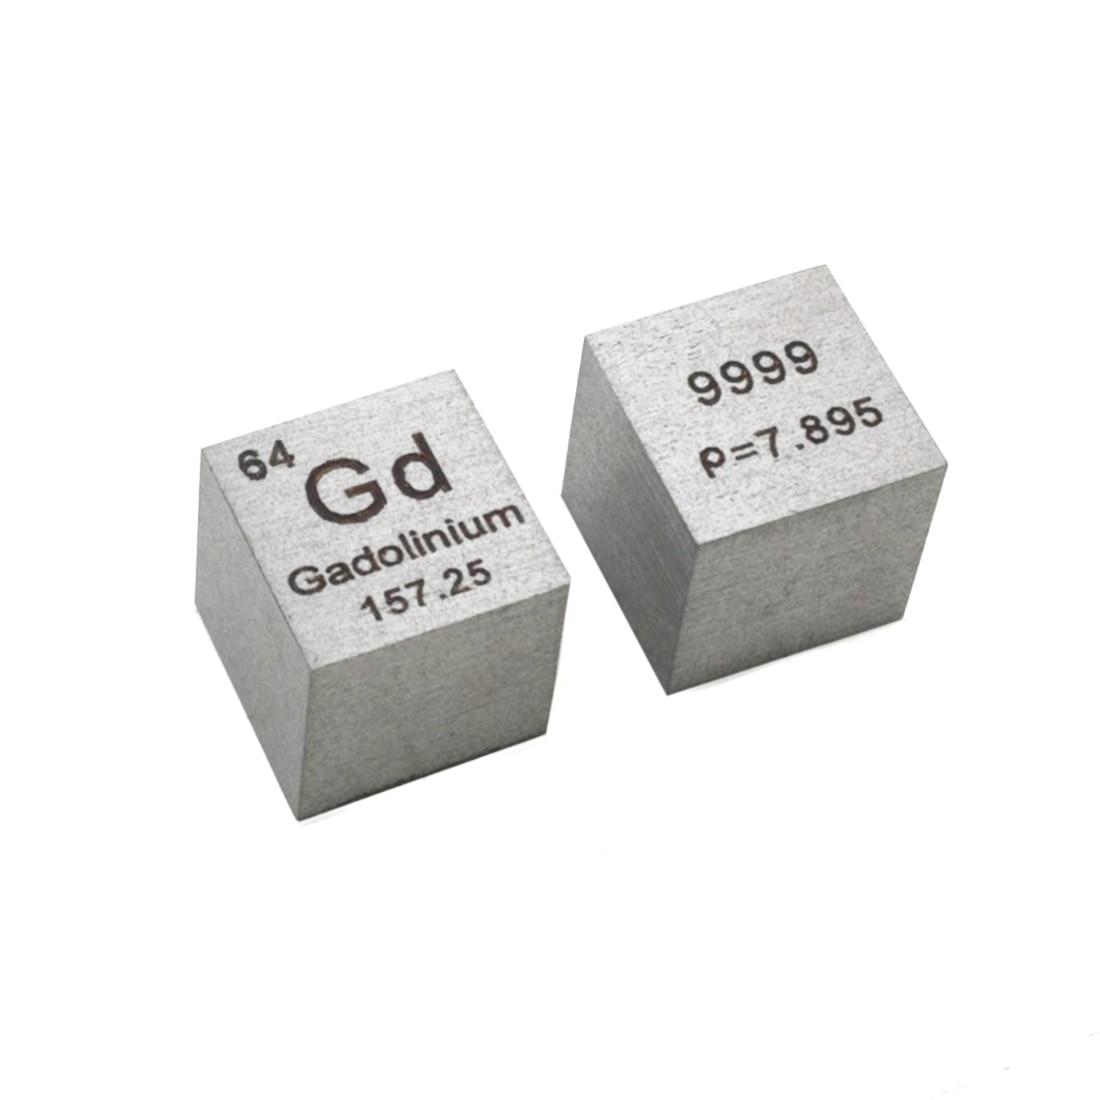 10 X 10 X 10mm Wiredrawing Metal Gadolinium Samarium  Yttrium Molybdenum Cube Rare Earth Elements Cube Periodic Elements Cube